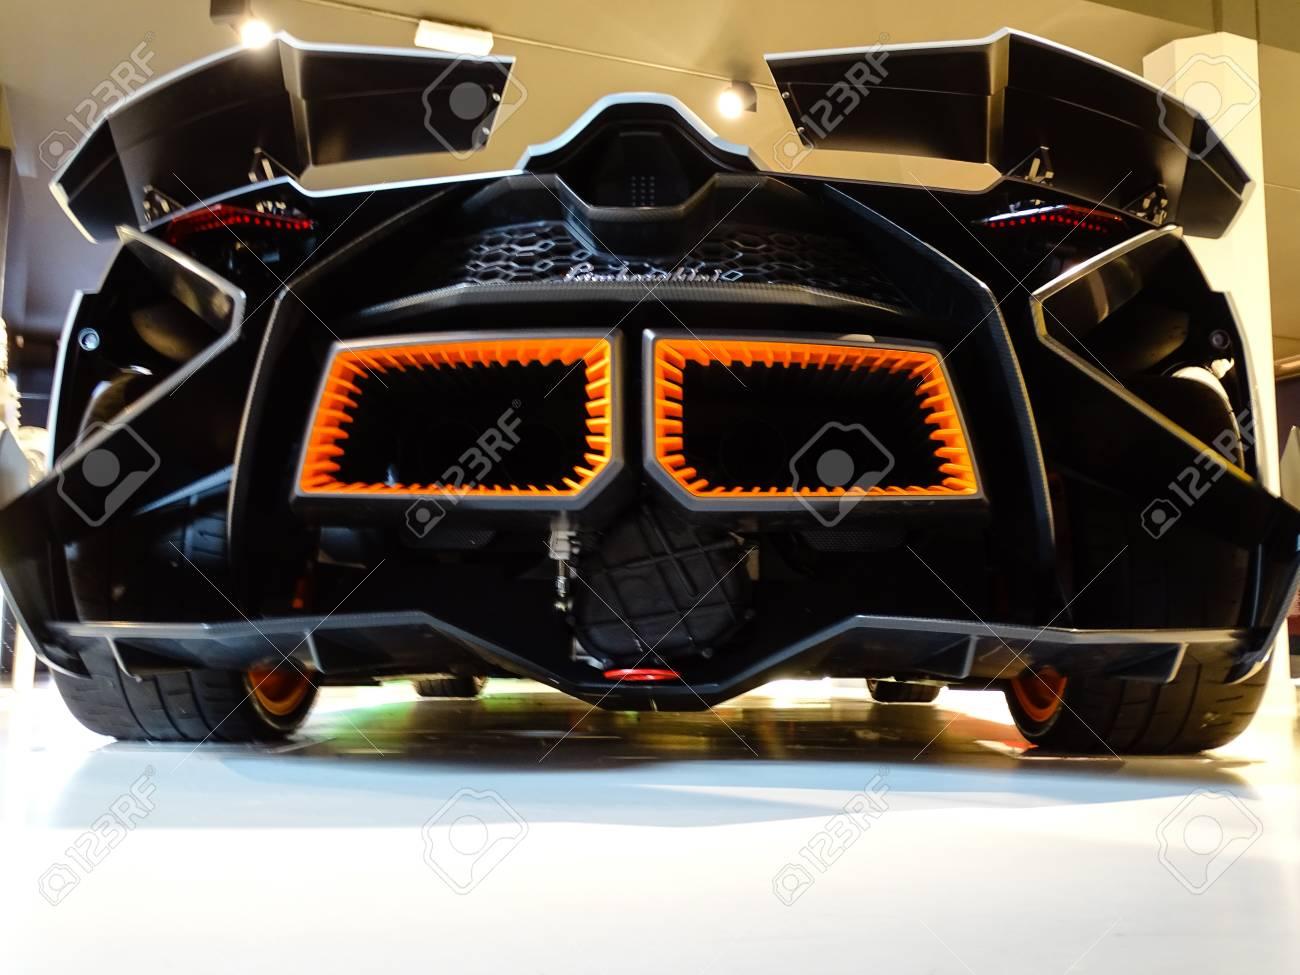 Sant Agata Bolognese Italy November 2016 Lamborghini Museum